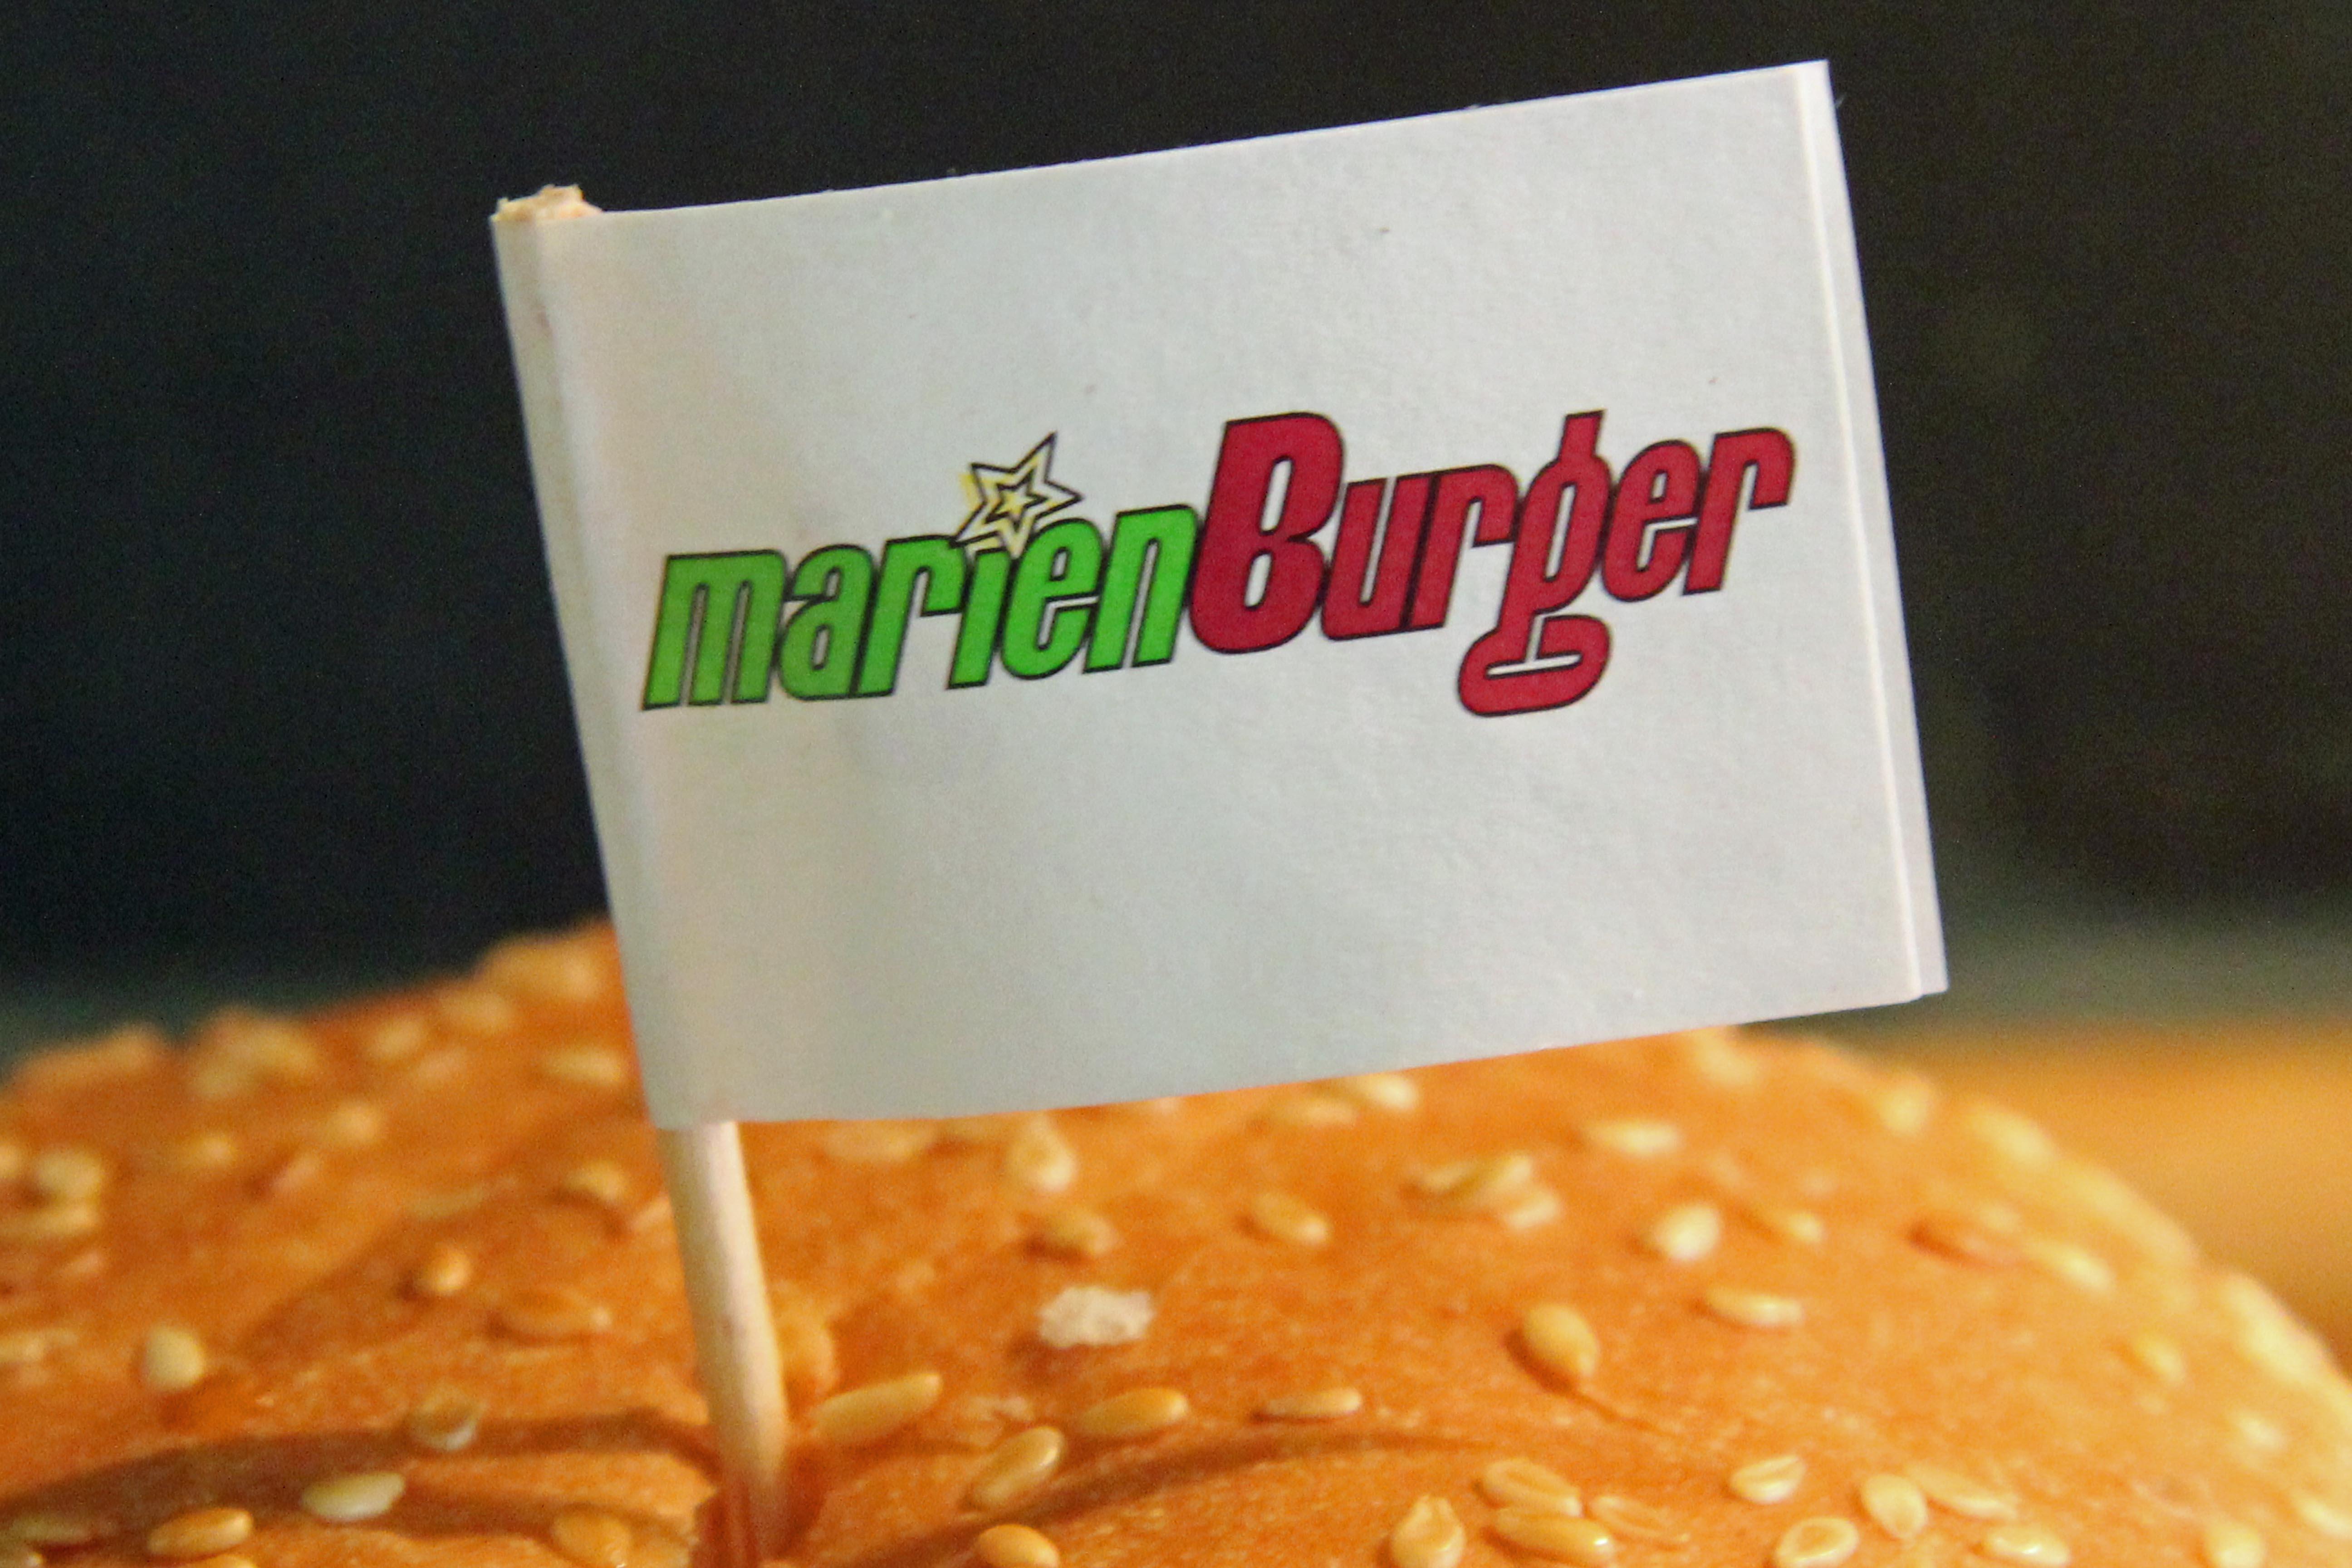 The Marienburger logo on a flag stuck in the burger bun in Berlin